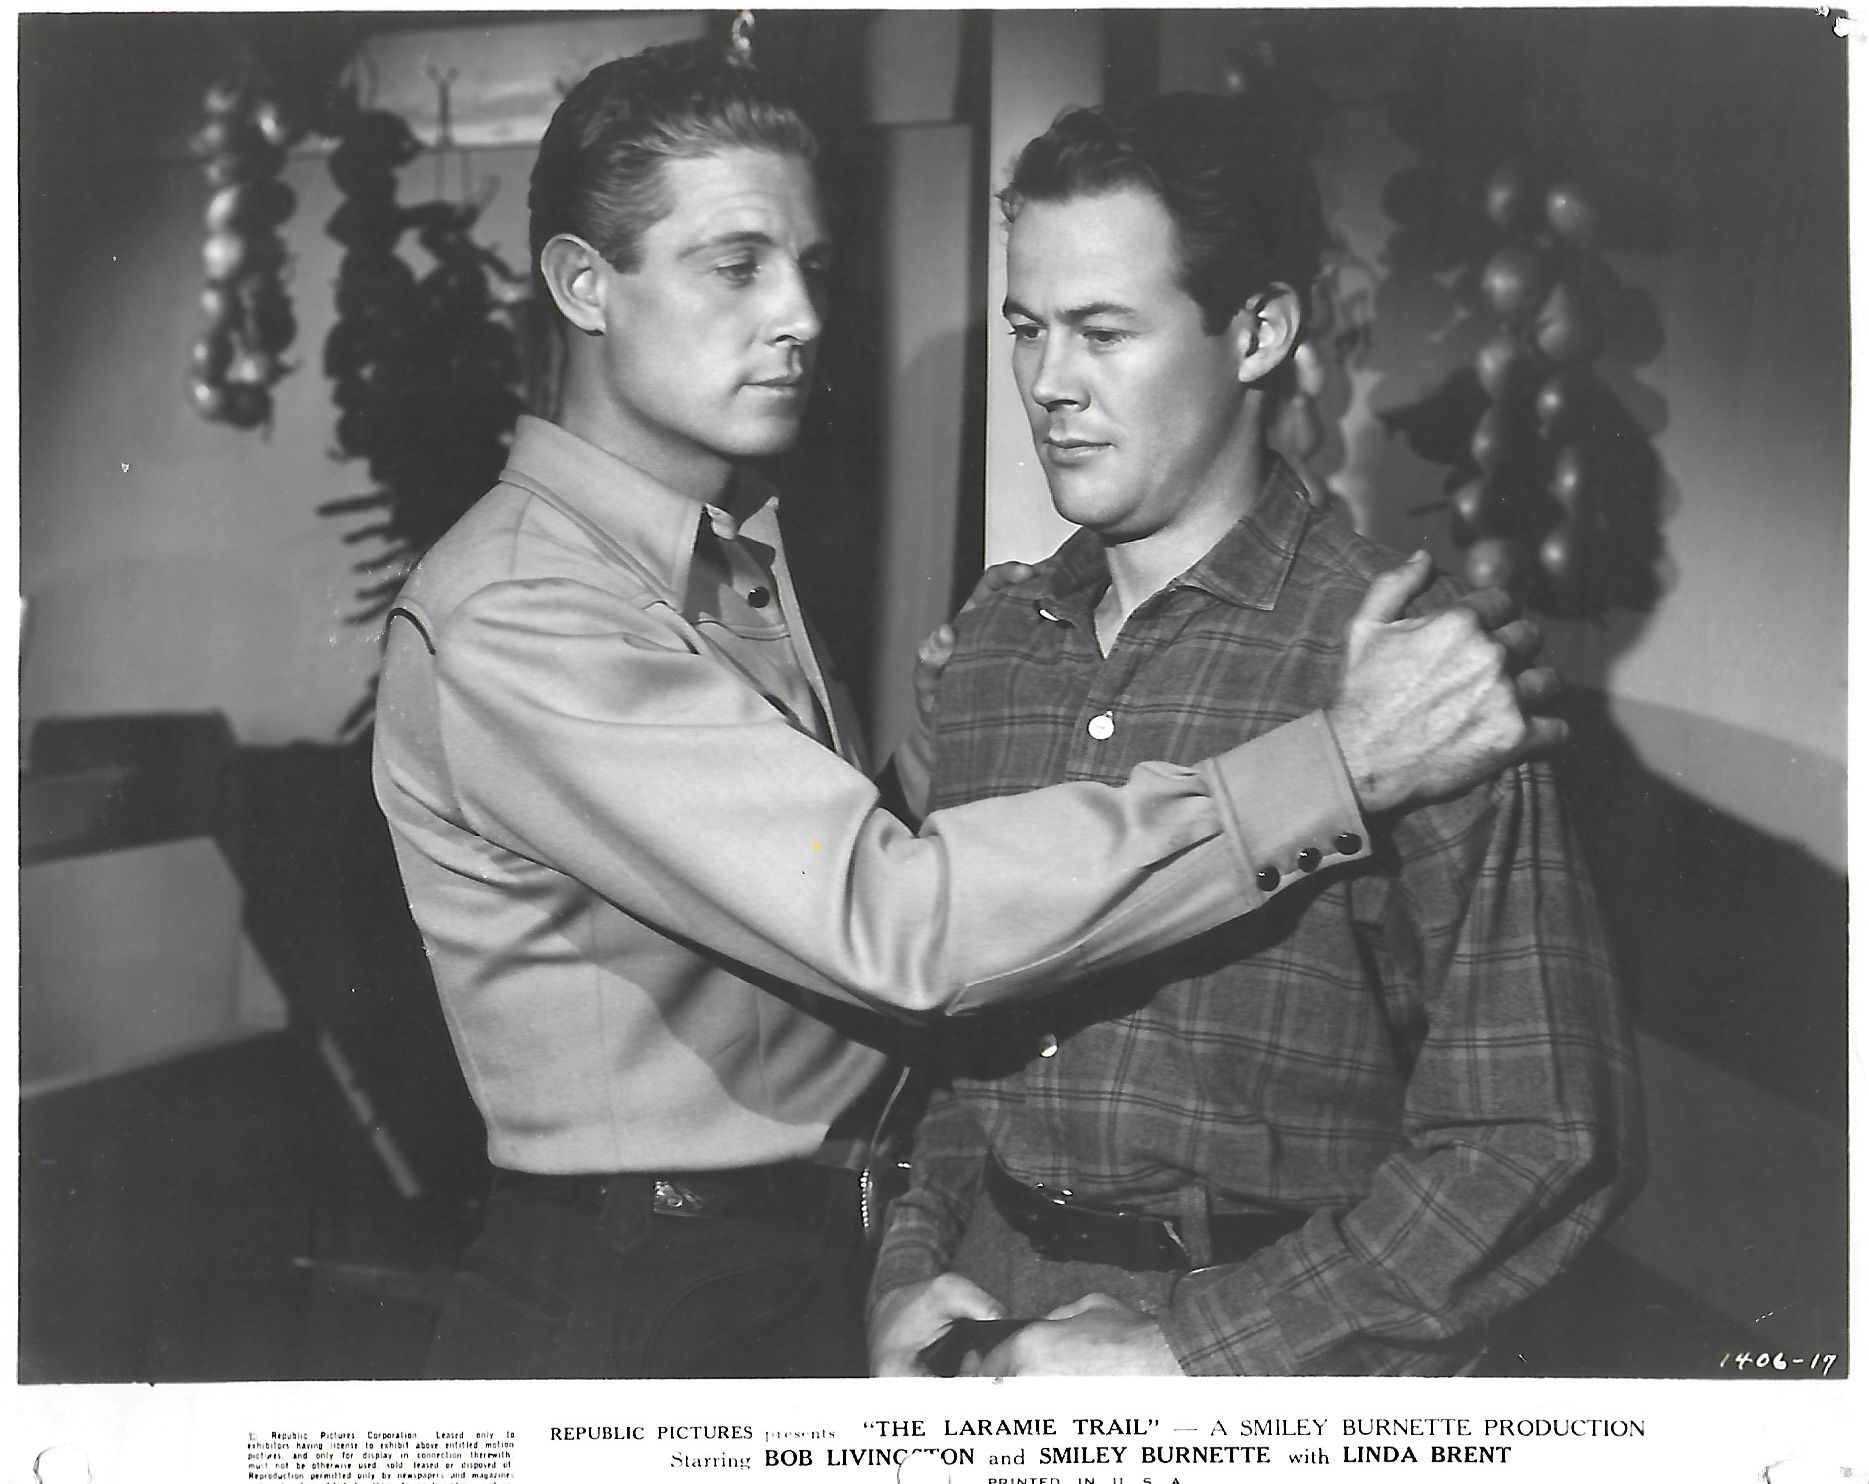 John James and Robert Livingston in The Laramie Trail (1944)